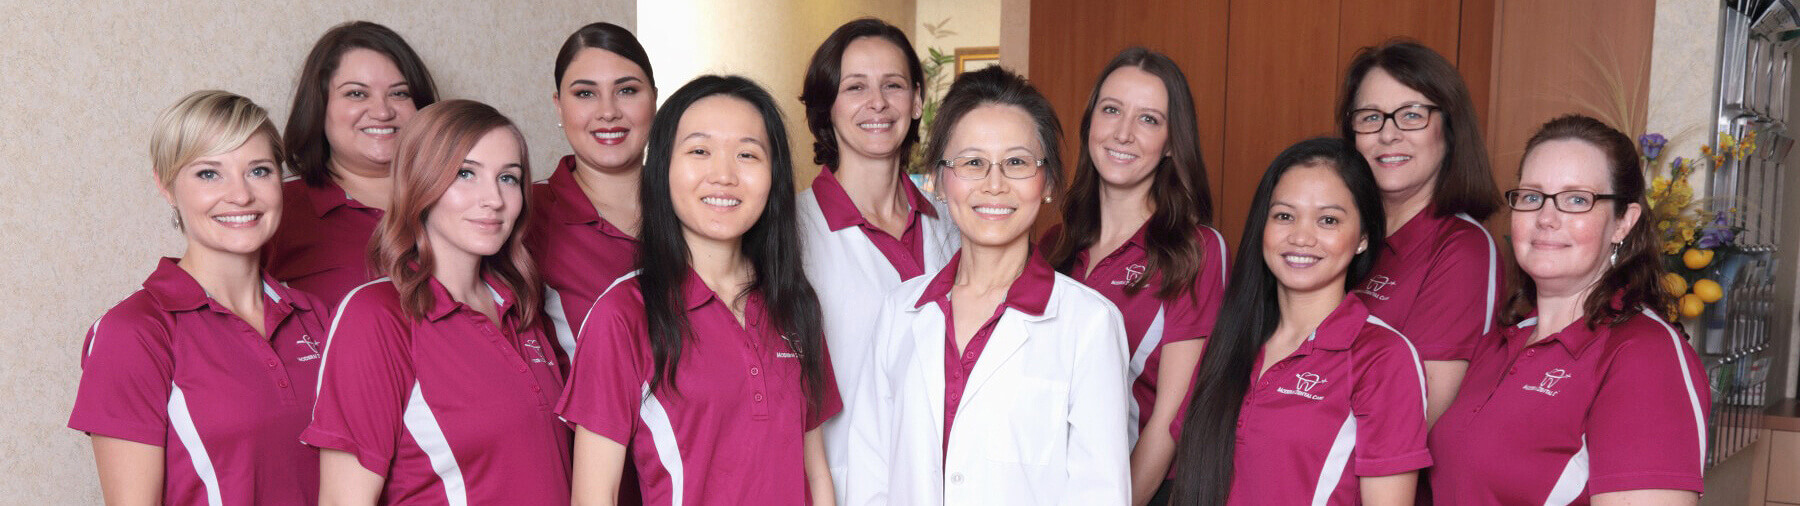 Modern Dental Care, Glendale Arizona Dentistry